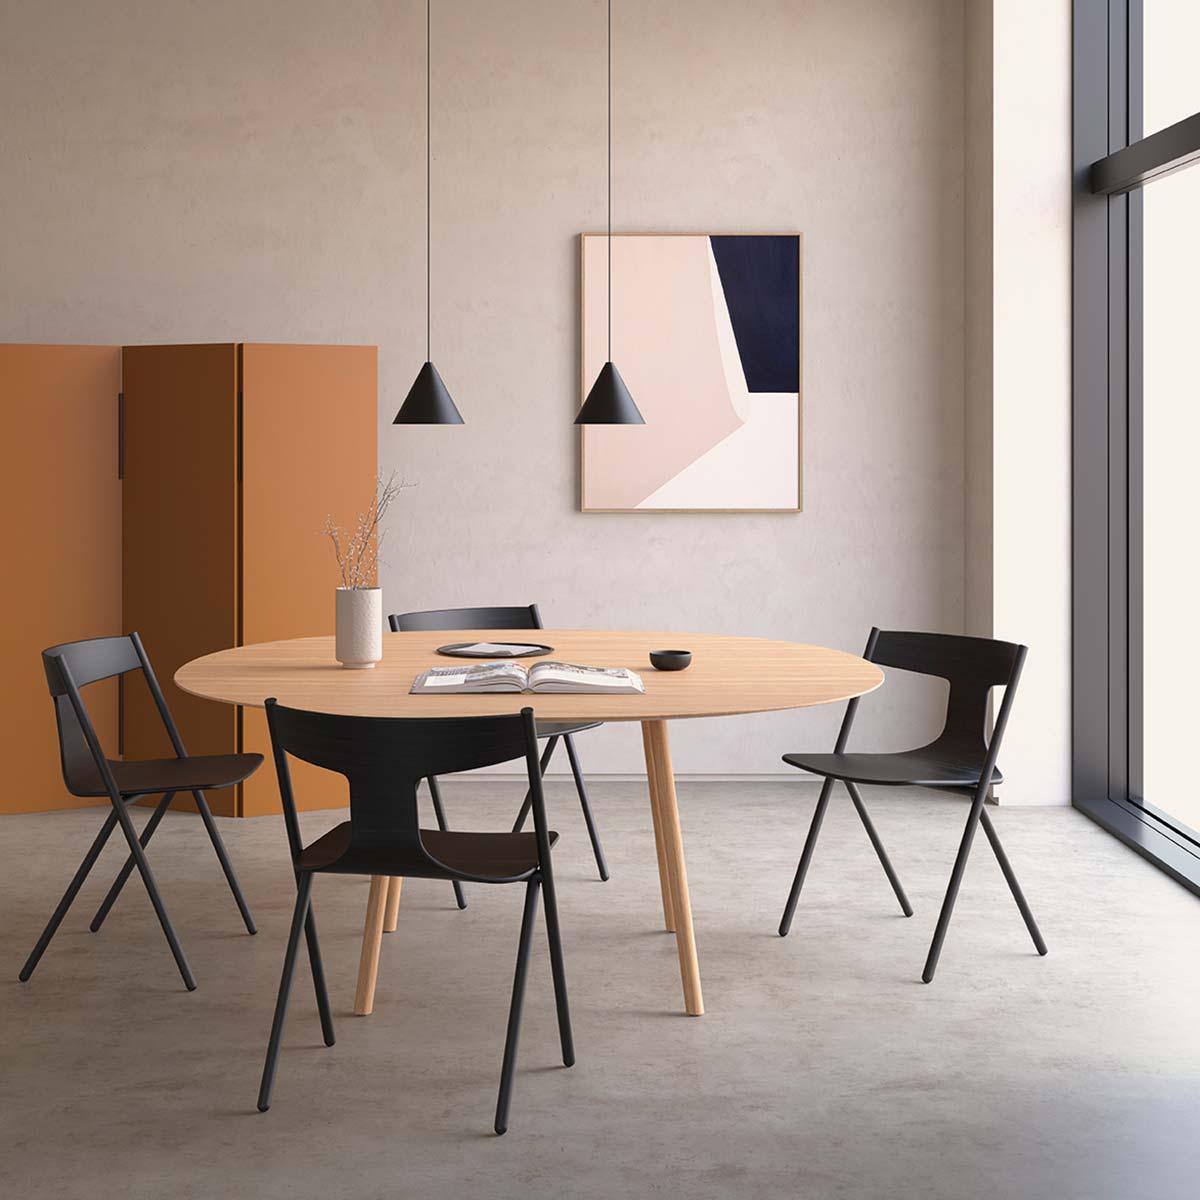 Quadra chair by Viccarbe - Design Mario Ferrarini